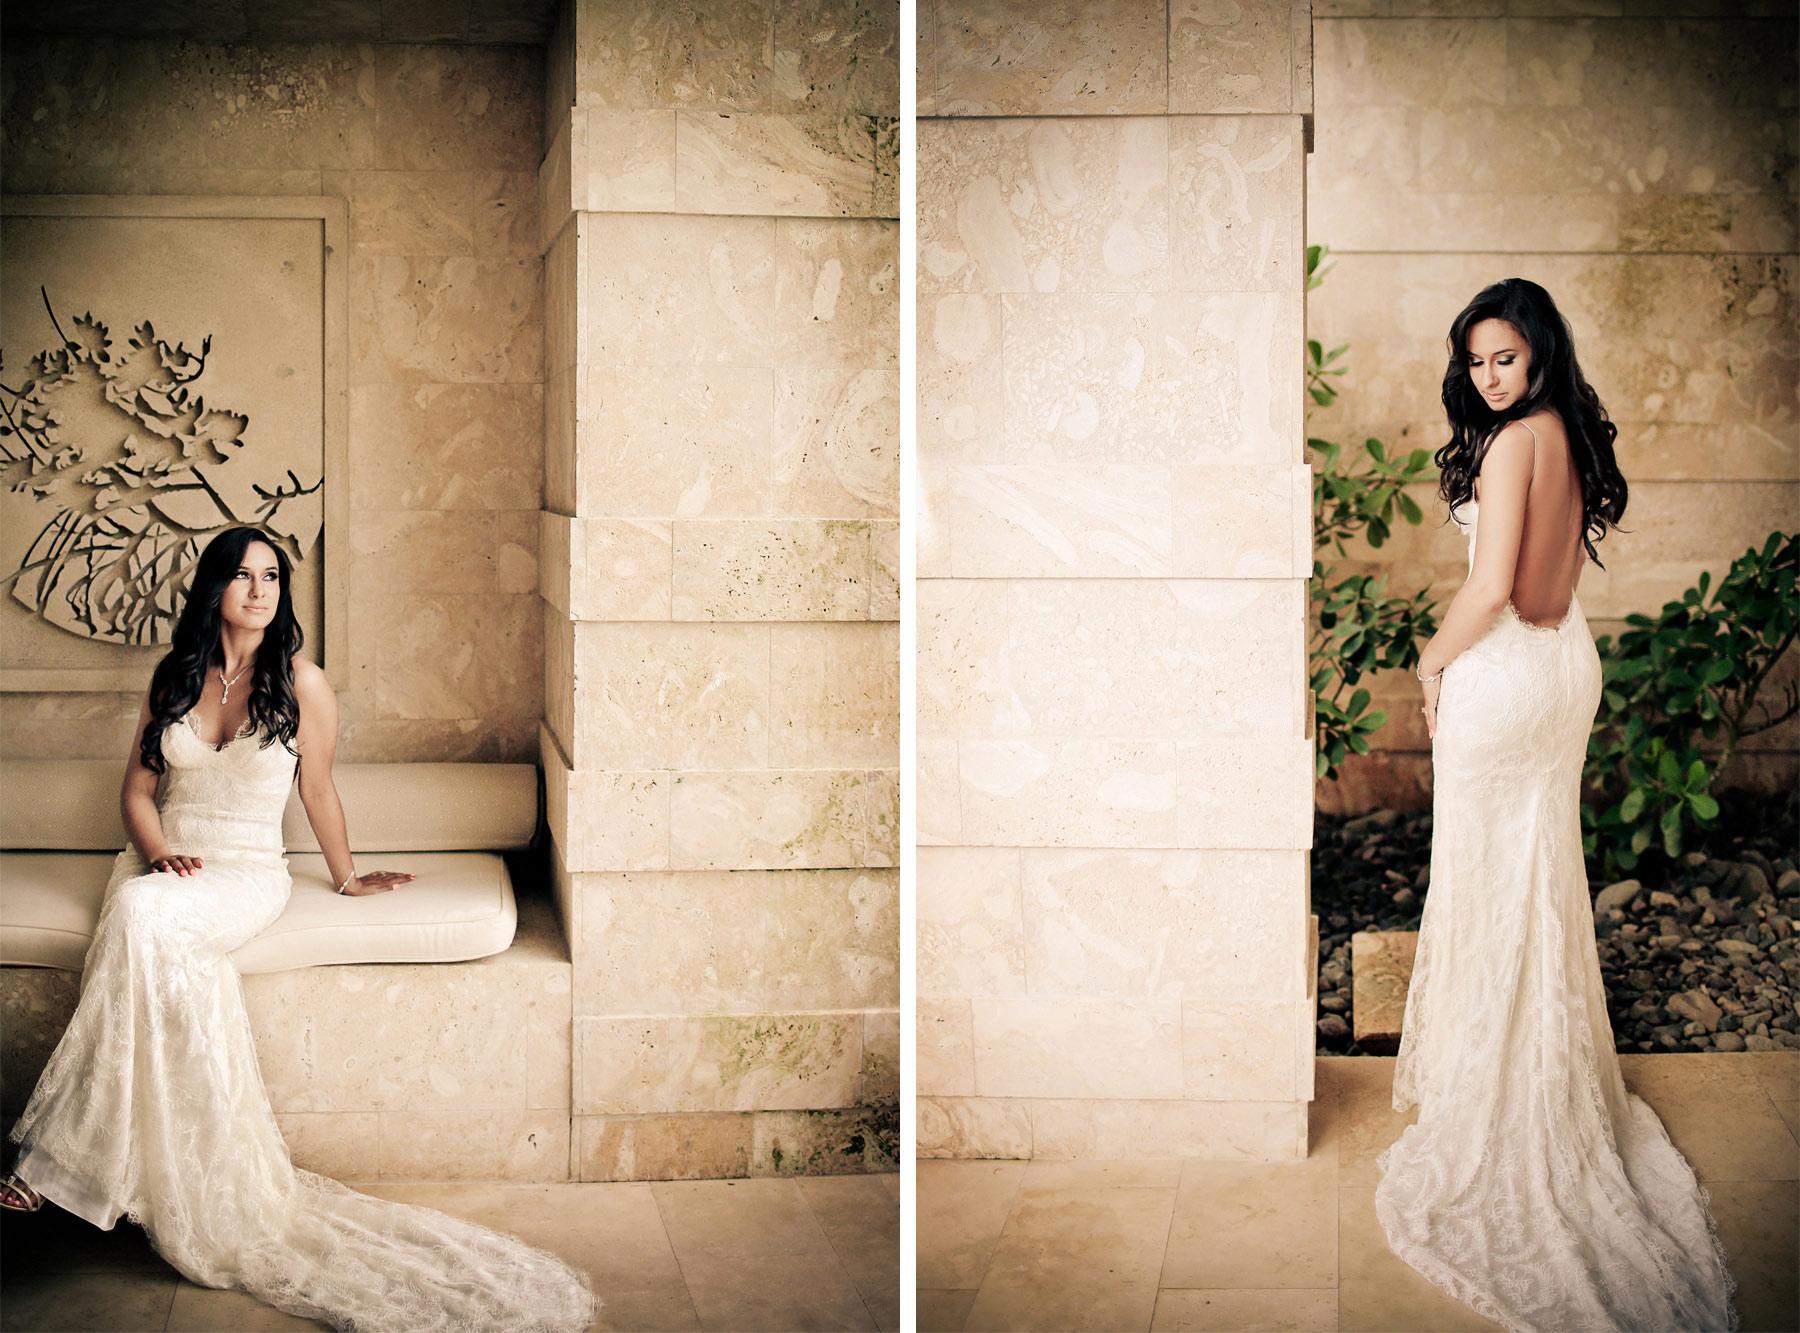 08-Puerto-Rico-Wedding-Photography-by-Vick-Photography-Destination-Wedding-Island-Tropical-Paradise-Resort-Bride-Dress-Chanel-and-Sam.jpg